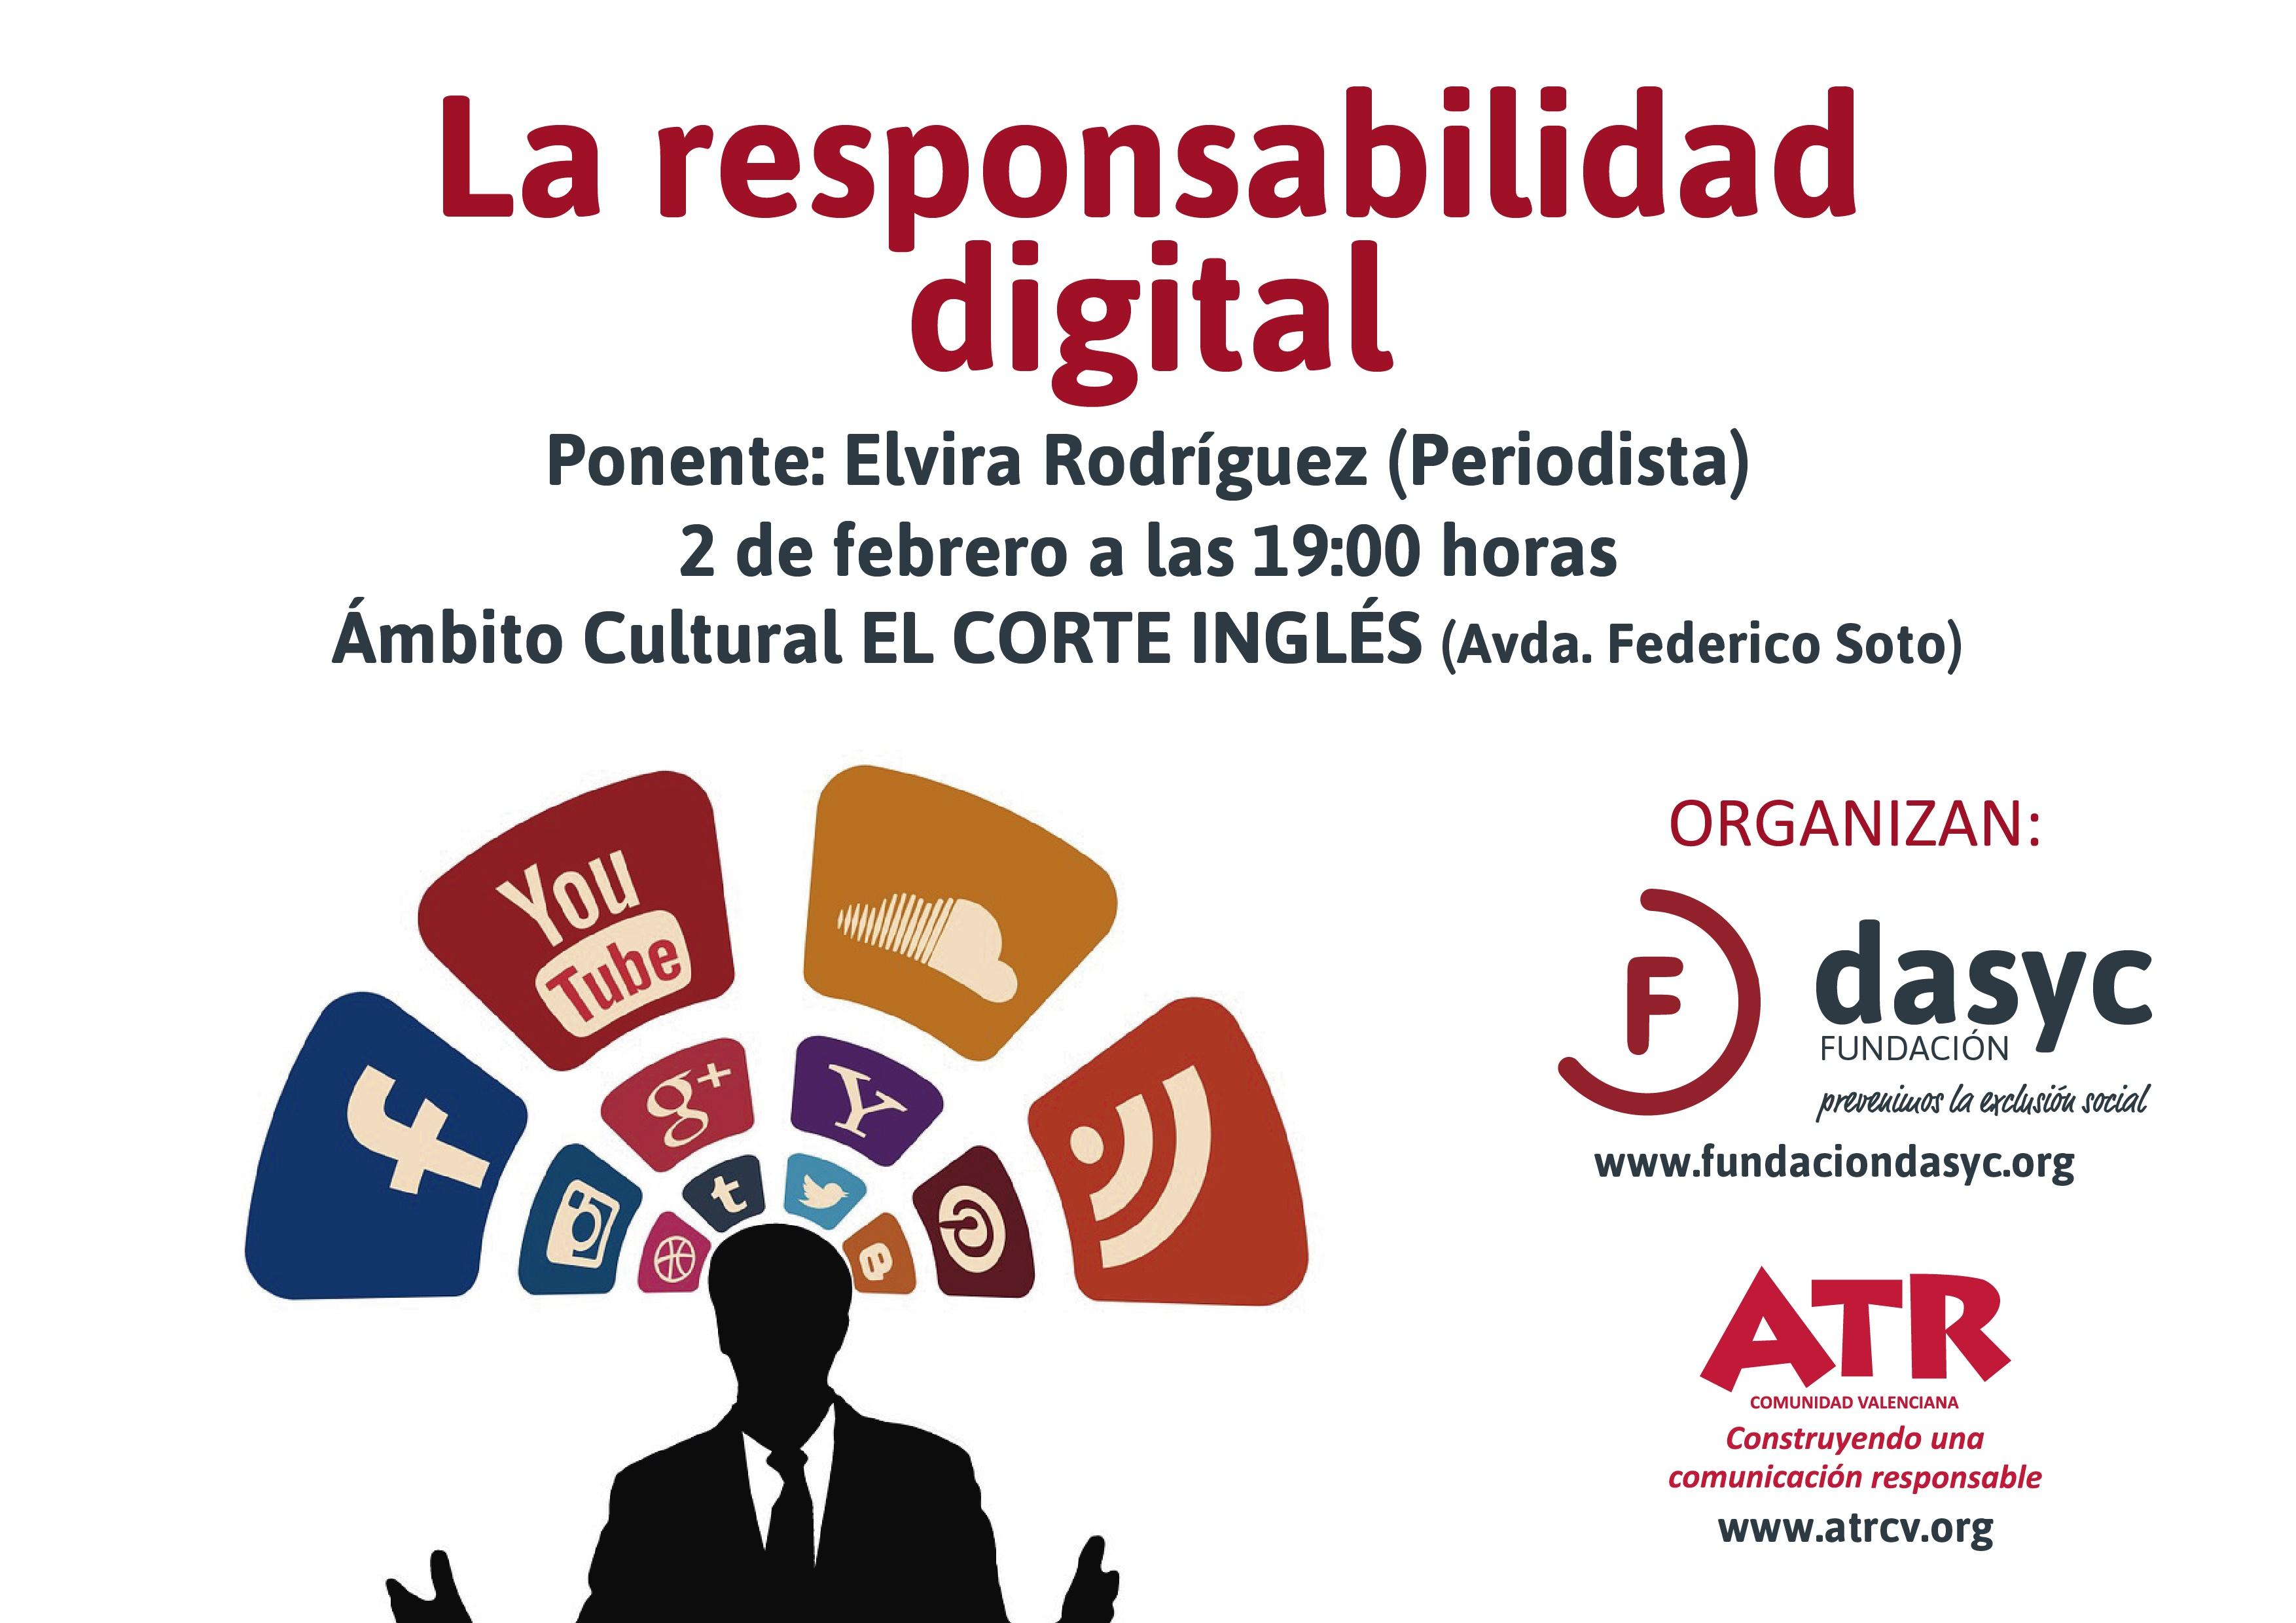 charla-la-responsabilidad-digital_elvira-r-2018-002